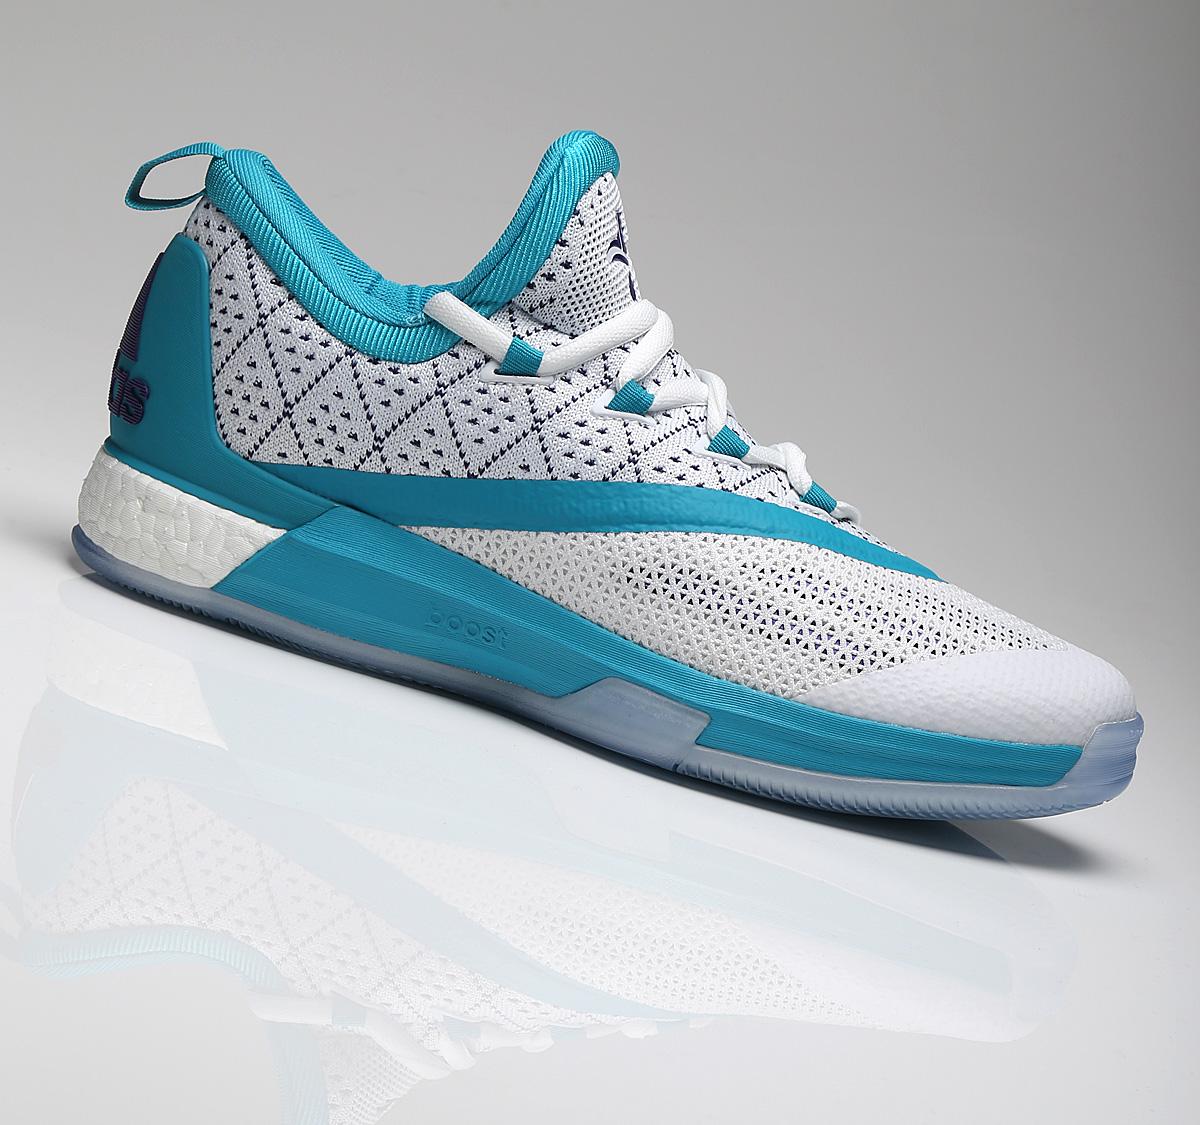 Jeremy-Lin-adidas-Crazylight-Boost_2-5-9